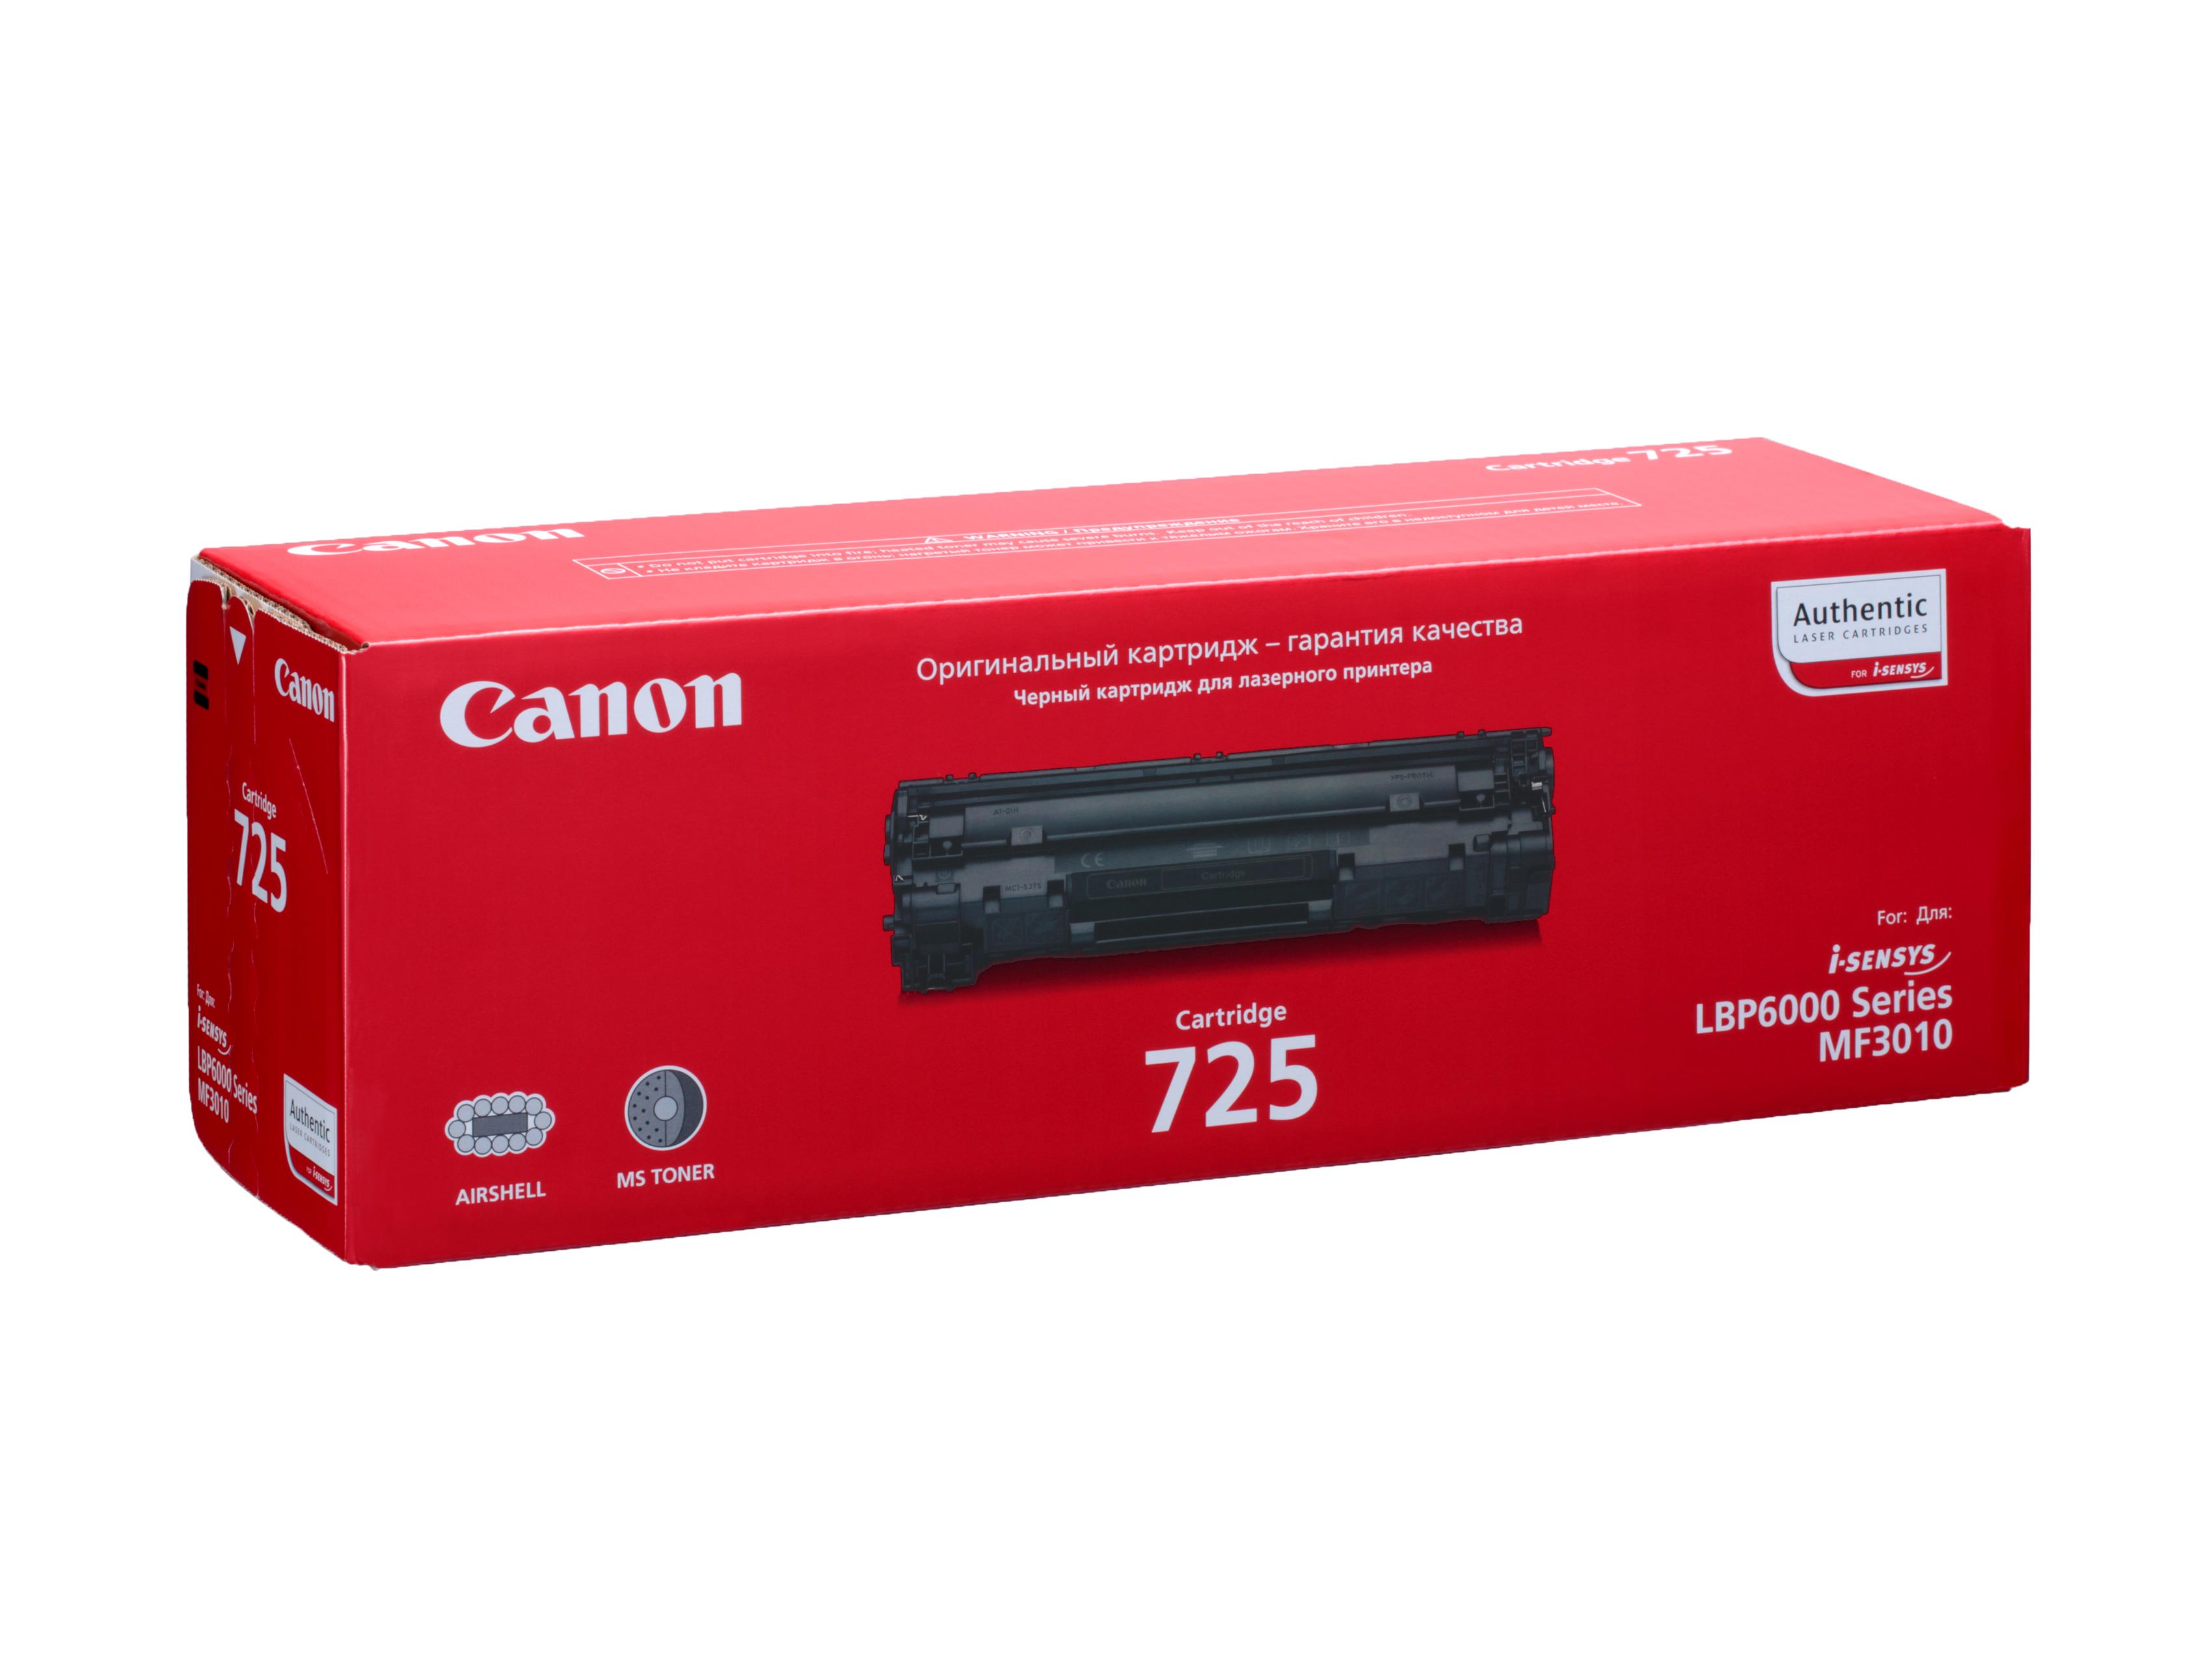 Картридж Canon 725 для LBP-6000/LBP-6000B. Чёрный. 1600 страниц. цена 2017